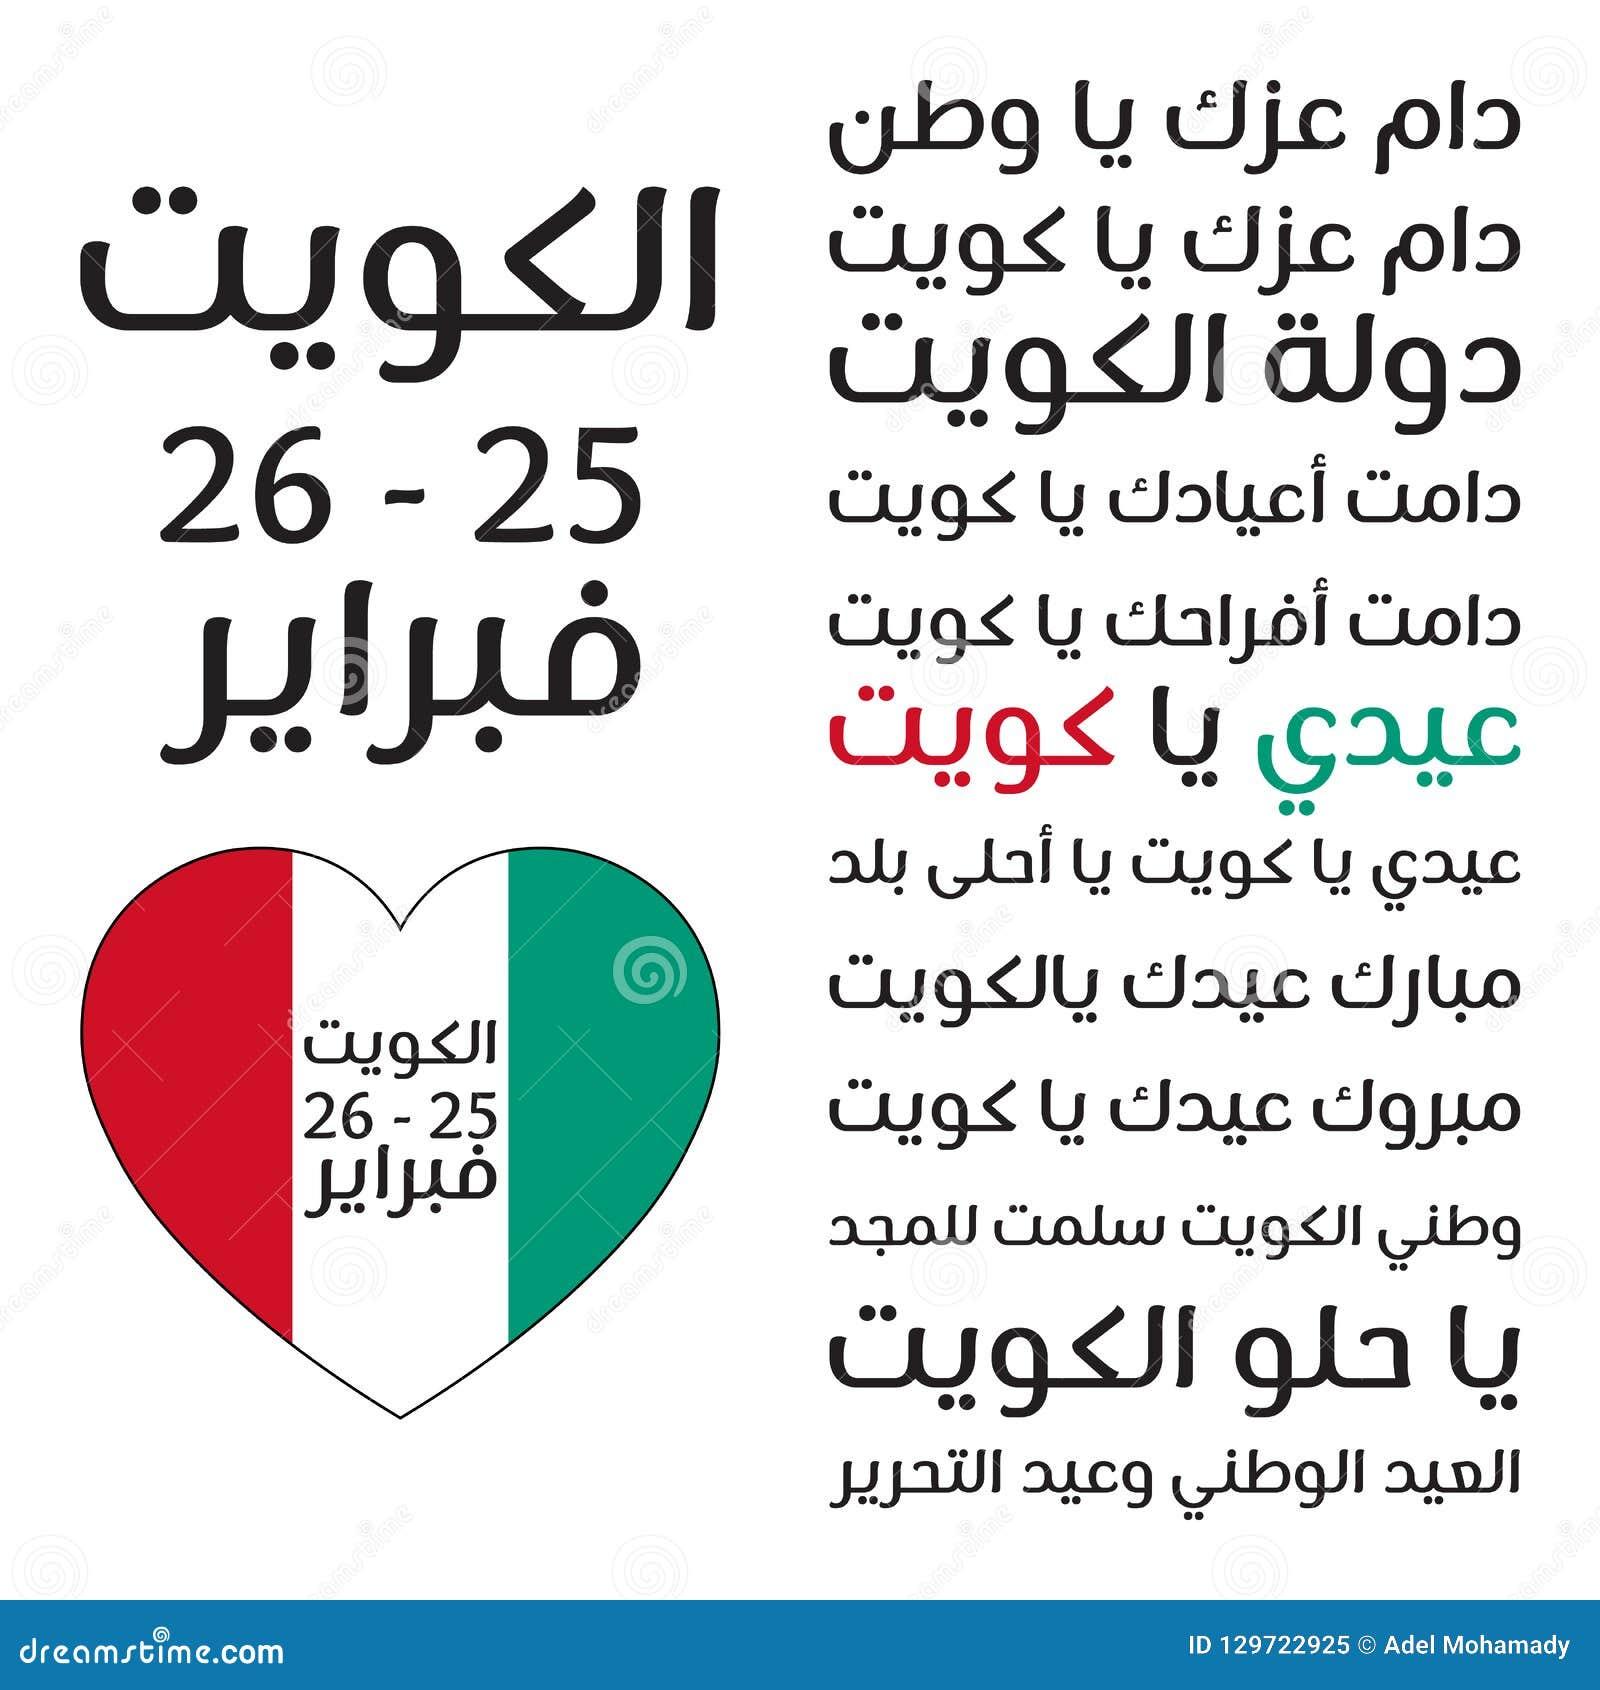 Kuwait National Day Stock Illustrations 3 195 Kuwait National Day Stock Illustrations Vectors Clipart Dreamstime